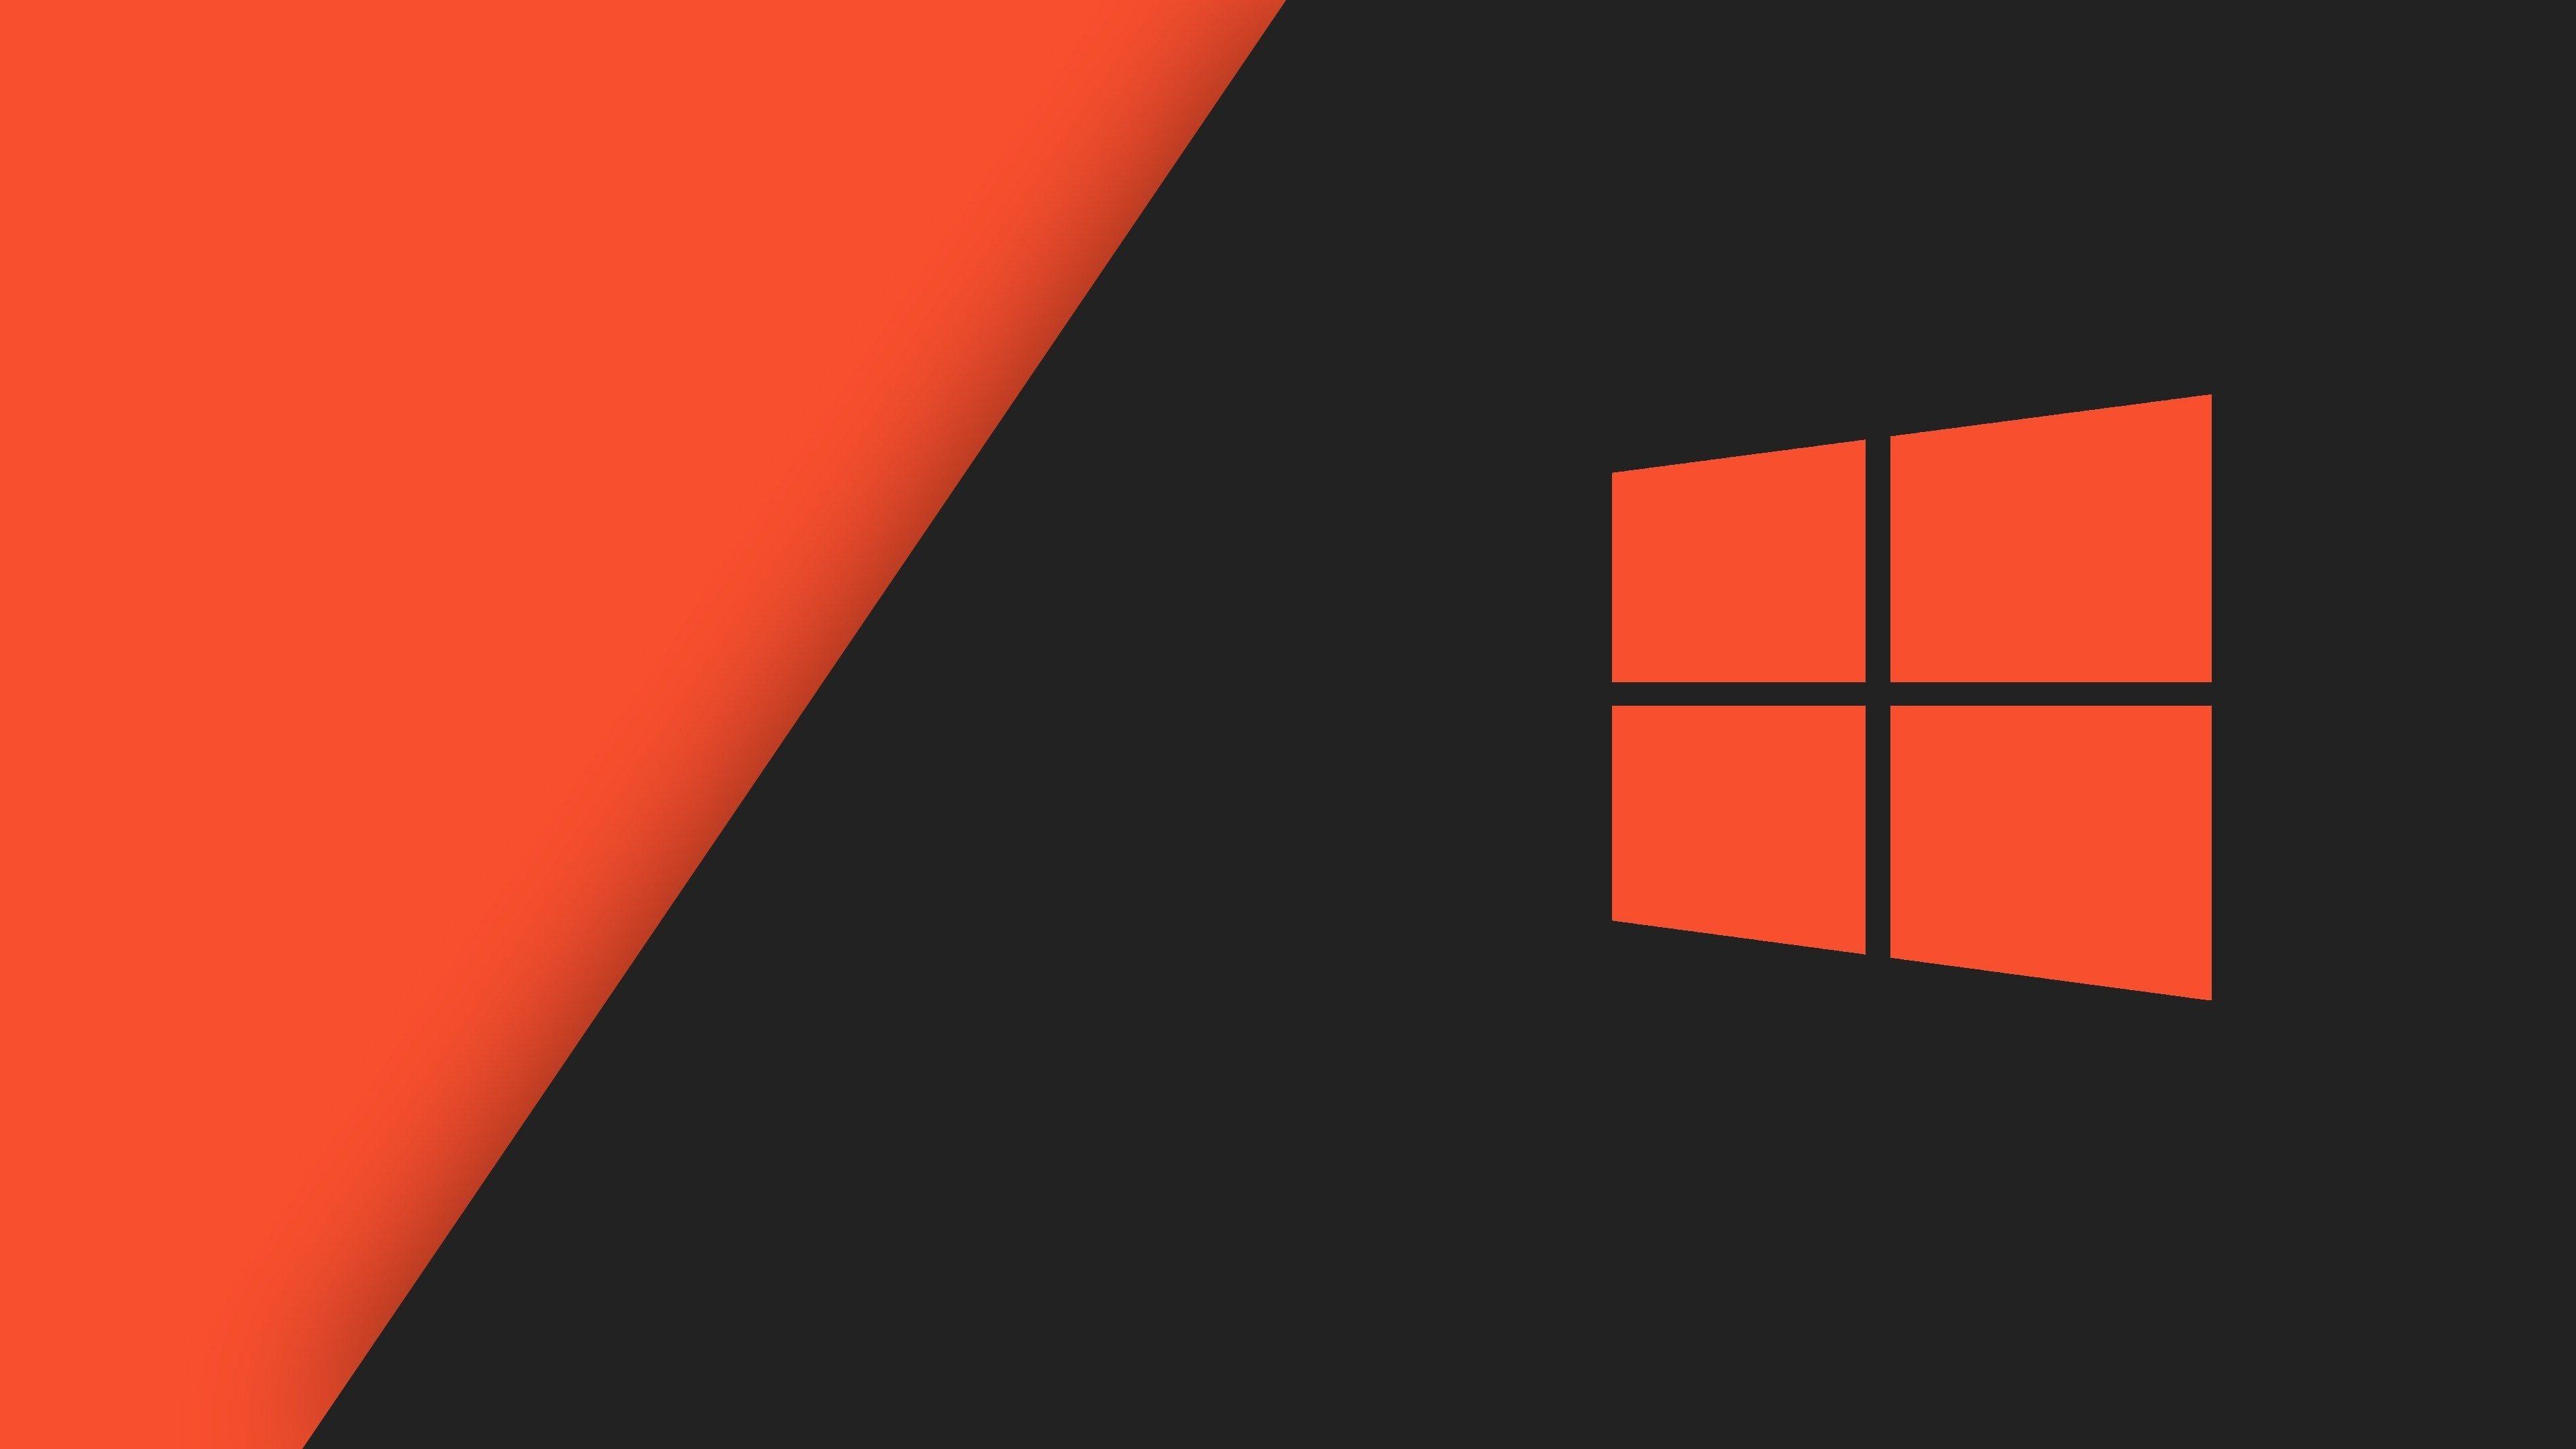 3840x2160 Windows 4k Wallpaper Hd Pc Download Samsung Wallpaper Wallpaper Windows 10 Uhd Wallpaper